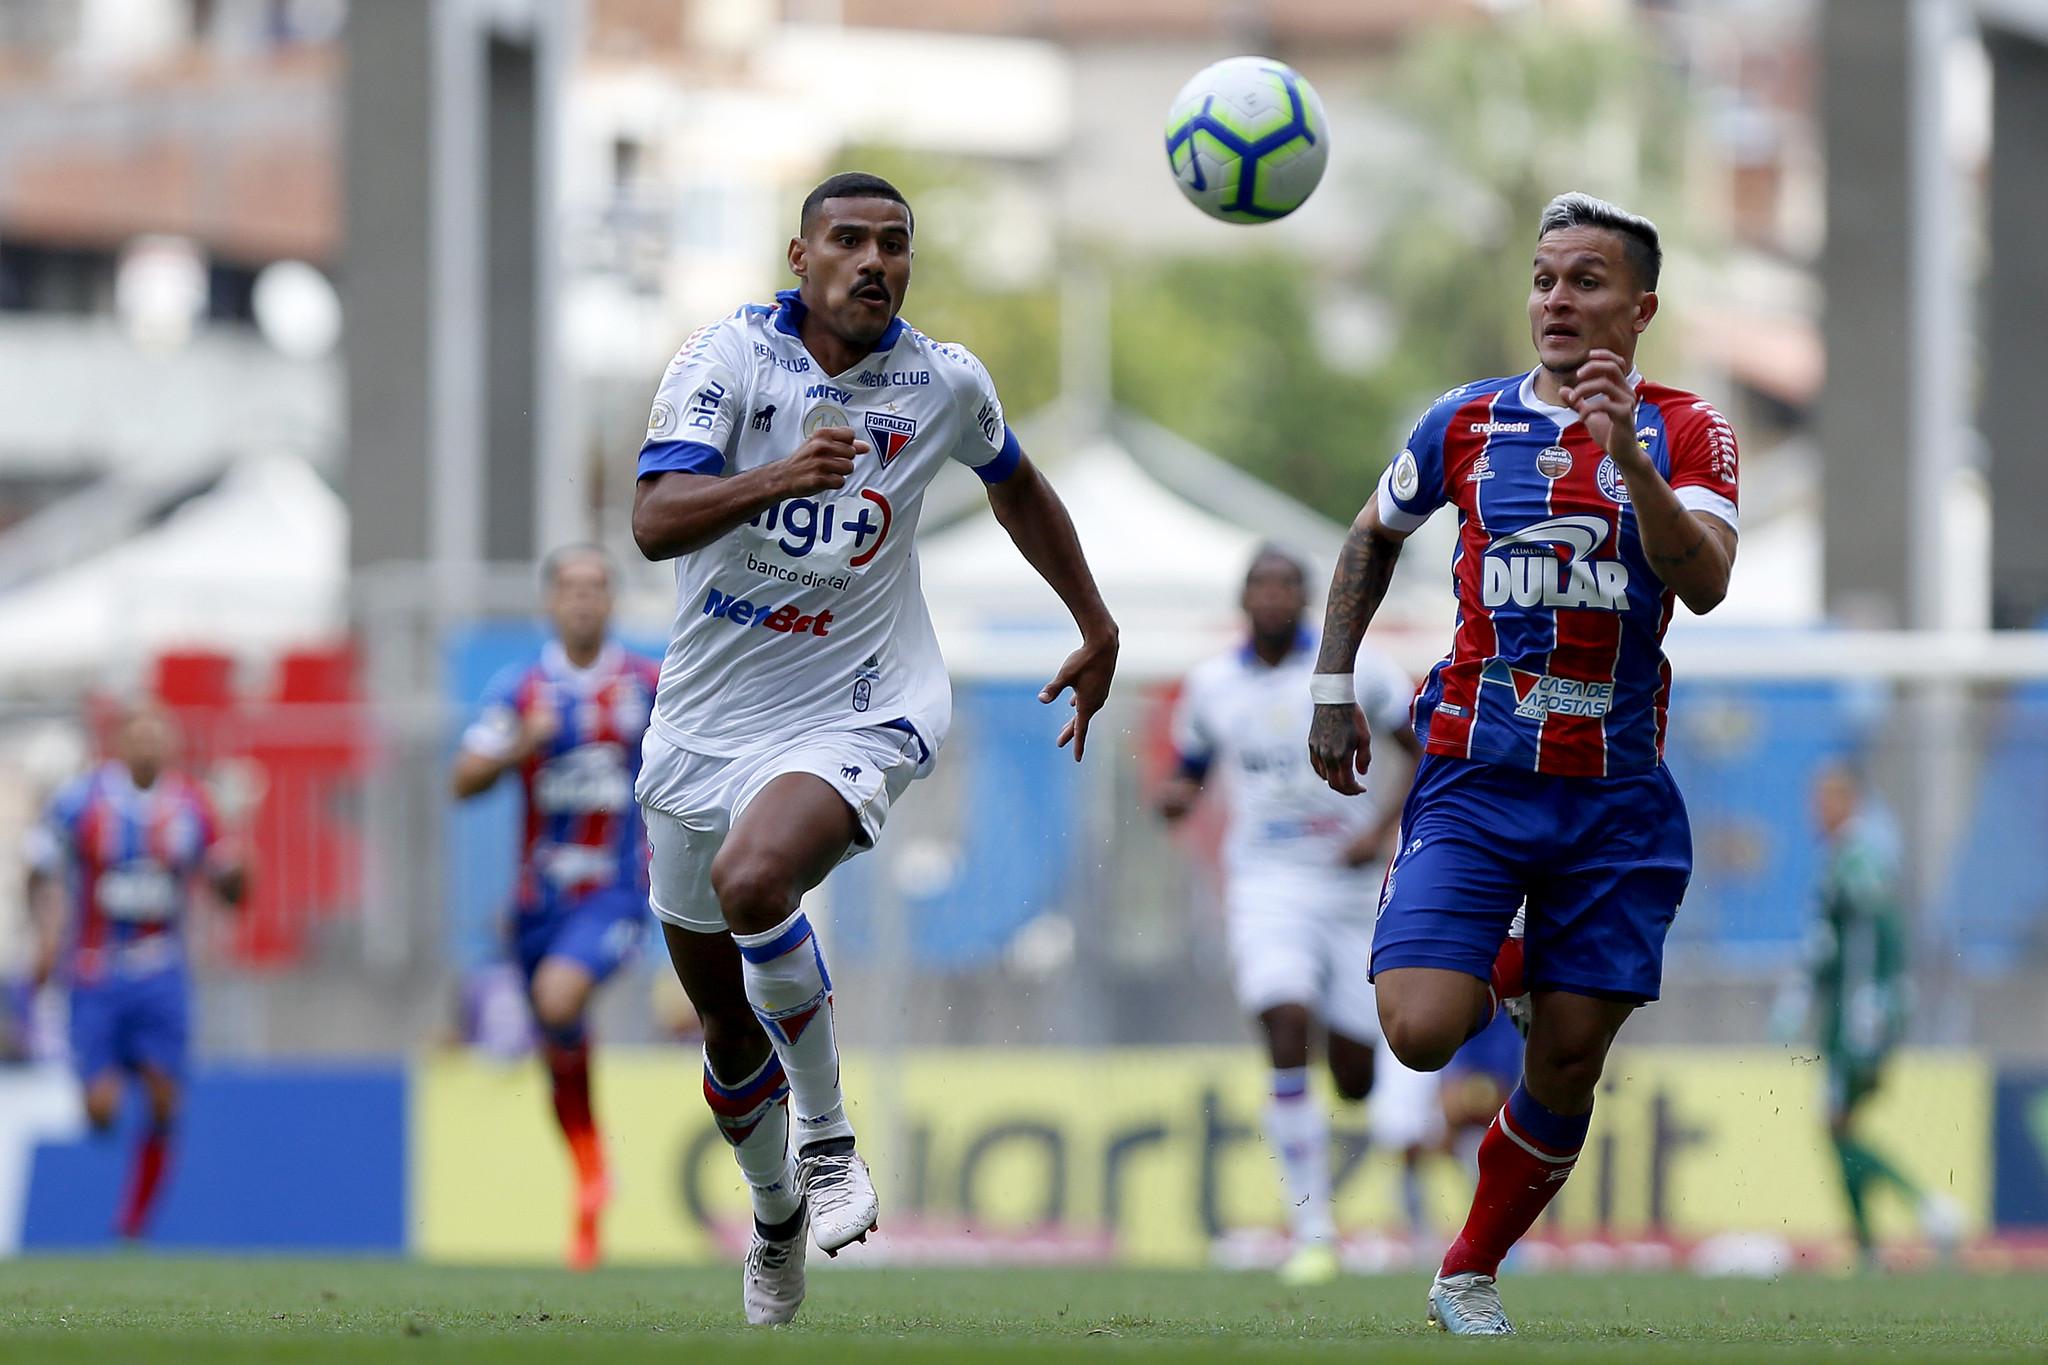 Clubes Do Nordeste Equilibram As Contas E O Jogo Contra Os Times Mais Ricos Esportes El Pais Brasil